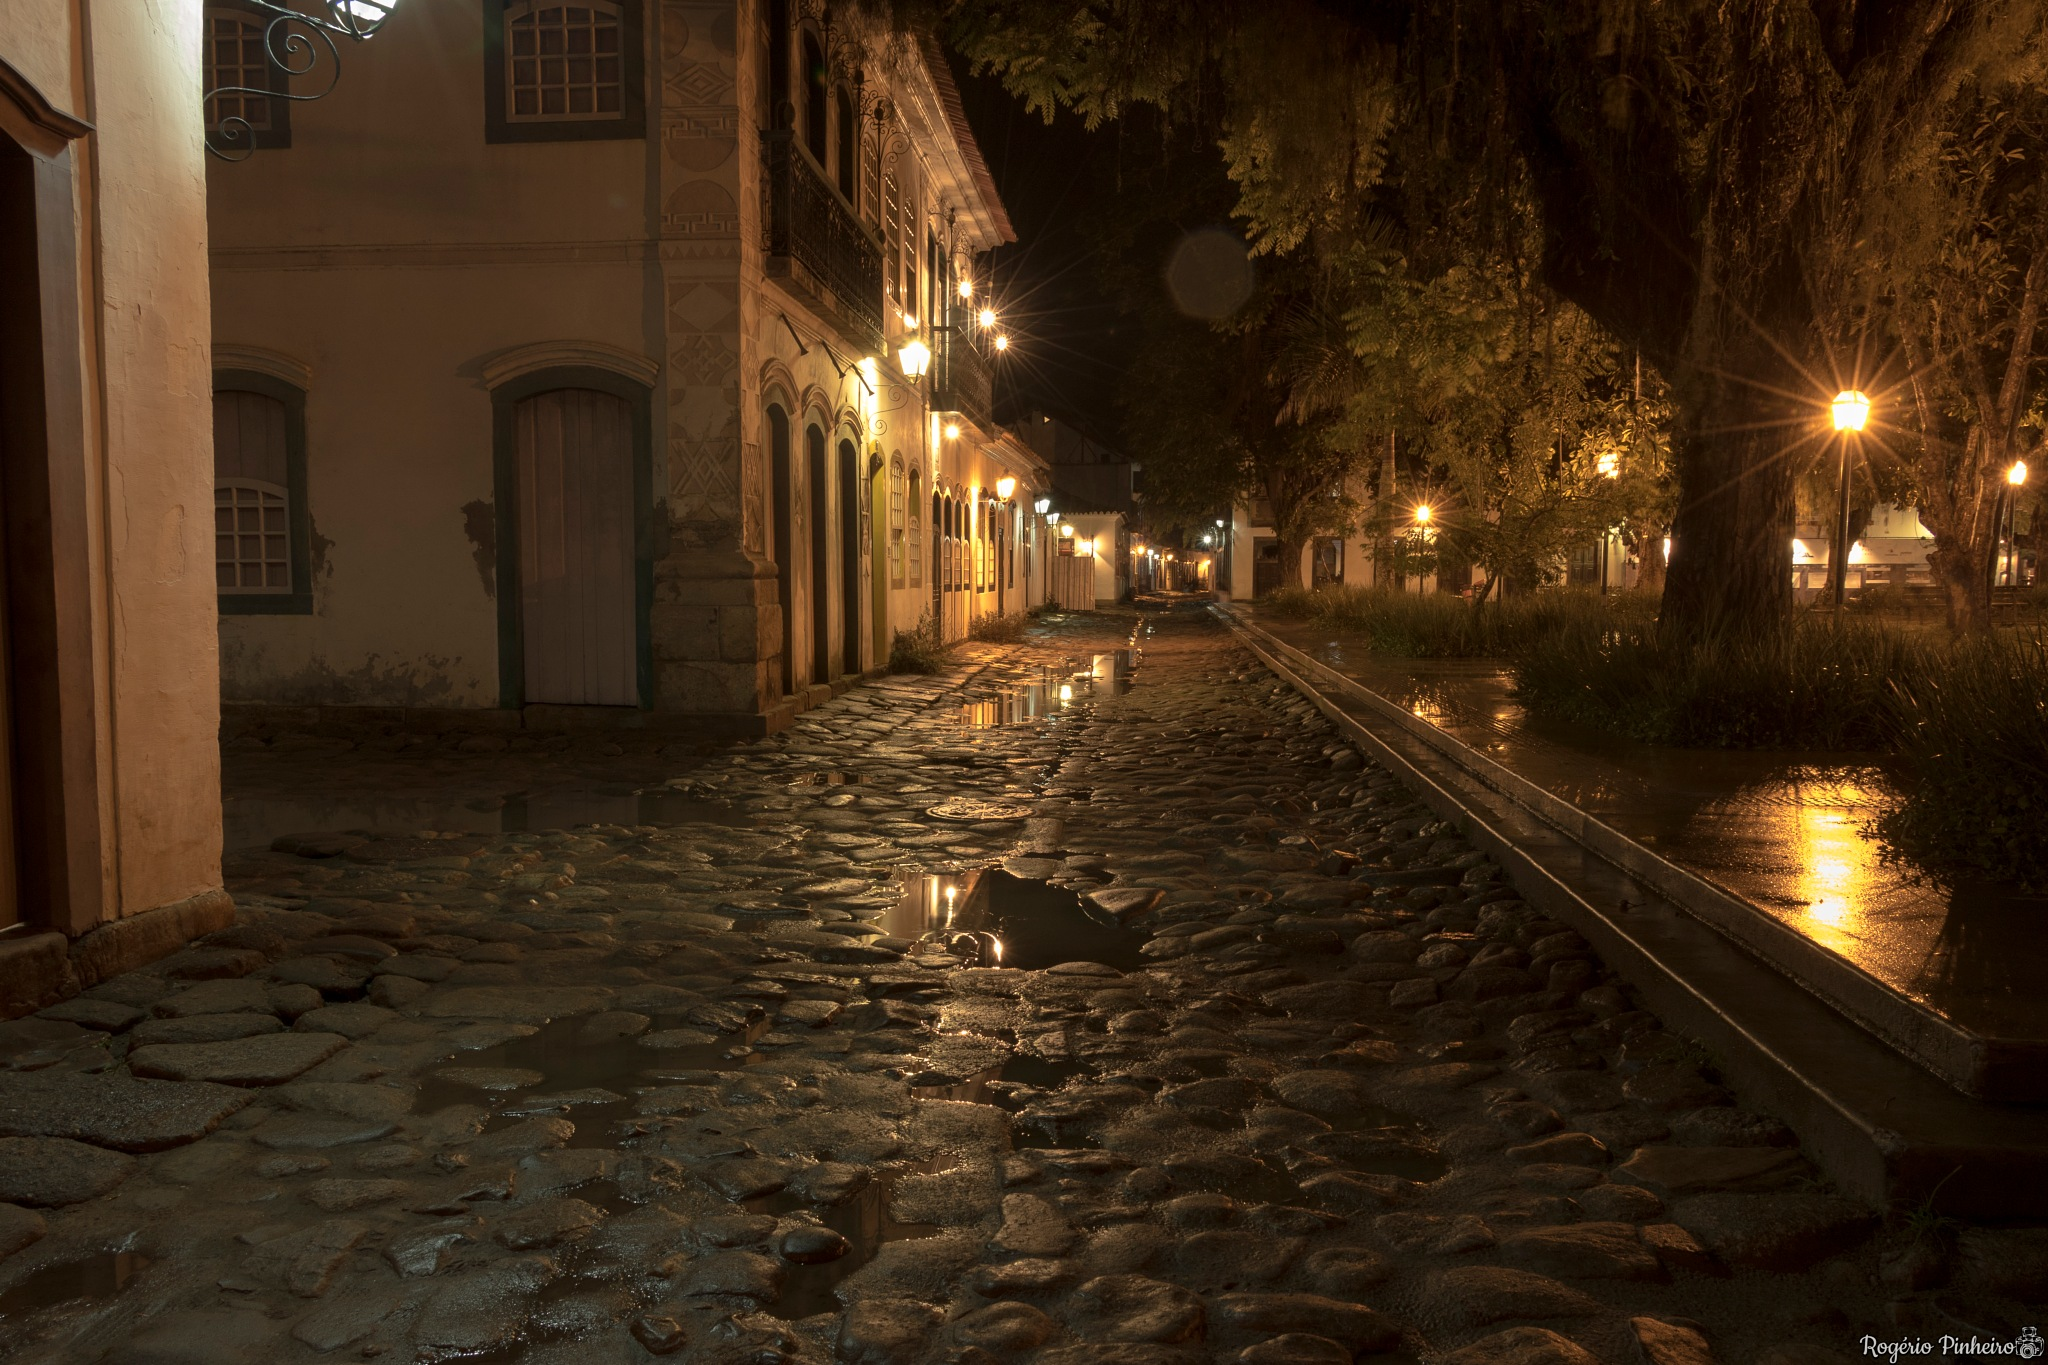 Rua - Street by Rogério Pinheiro